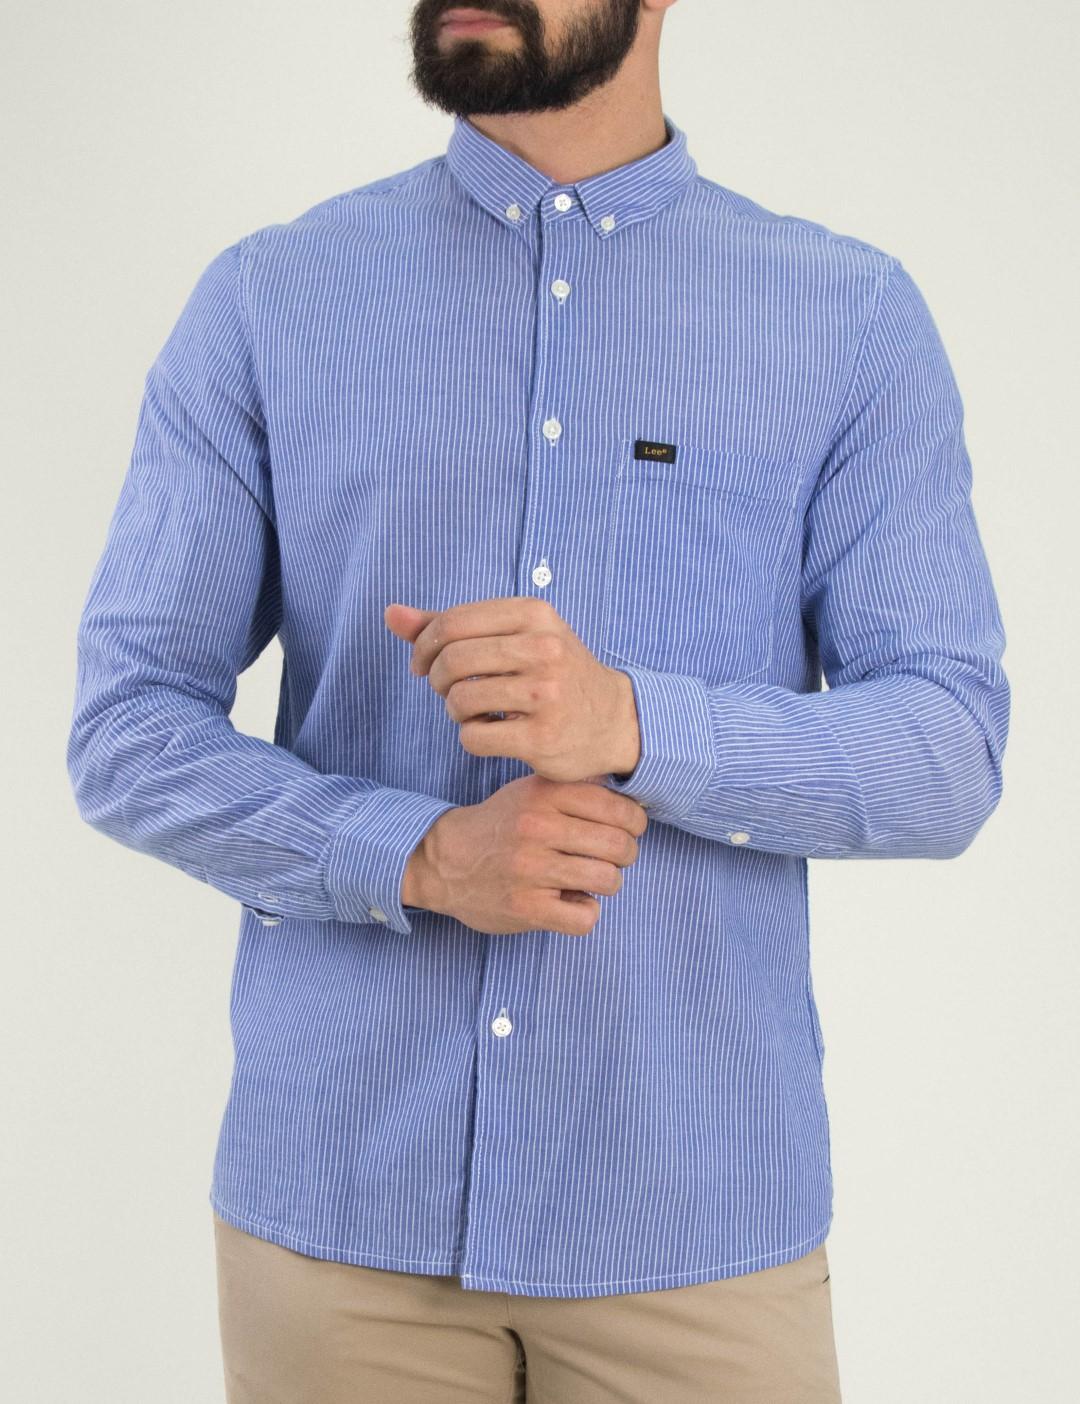 ce452258a09f Ανδρικό σιέλ ριγέ πουκάμισο Lee με τσεπάκι L66XNGLH